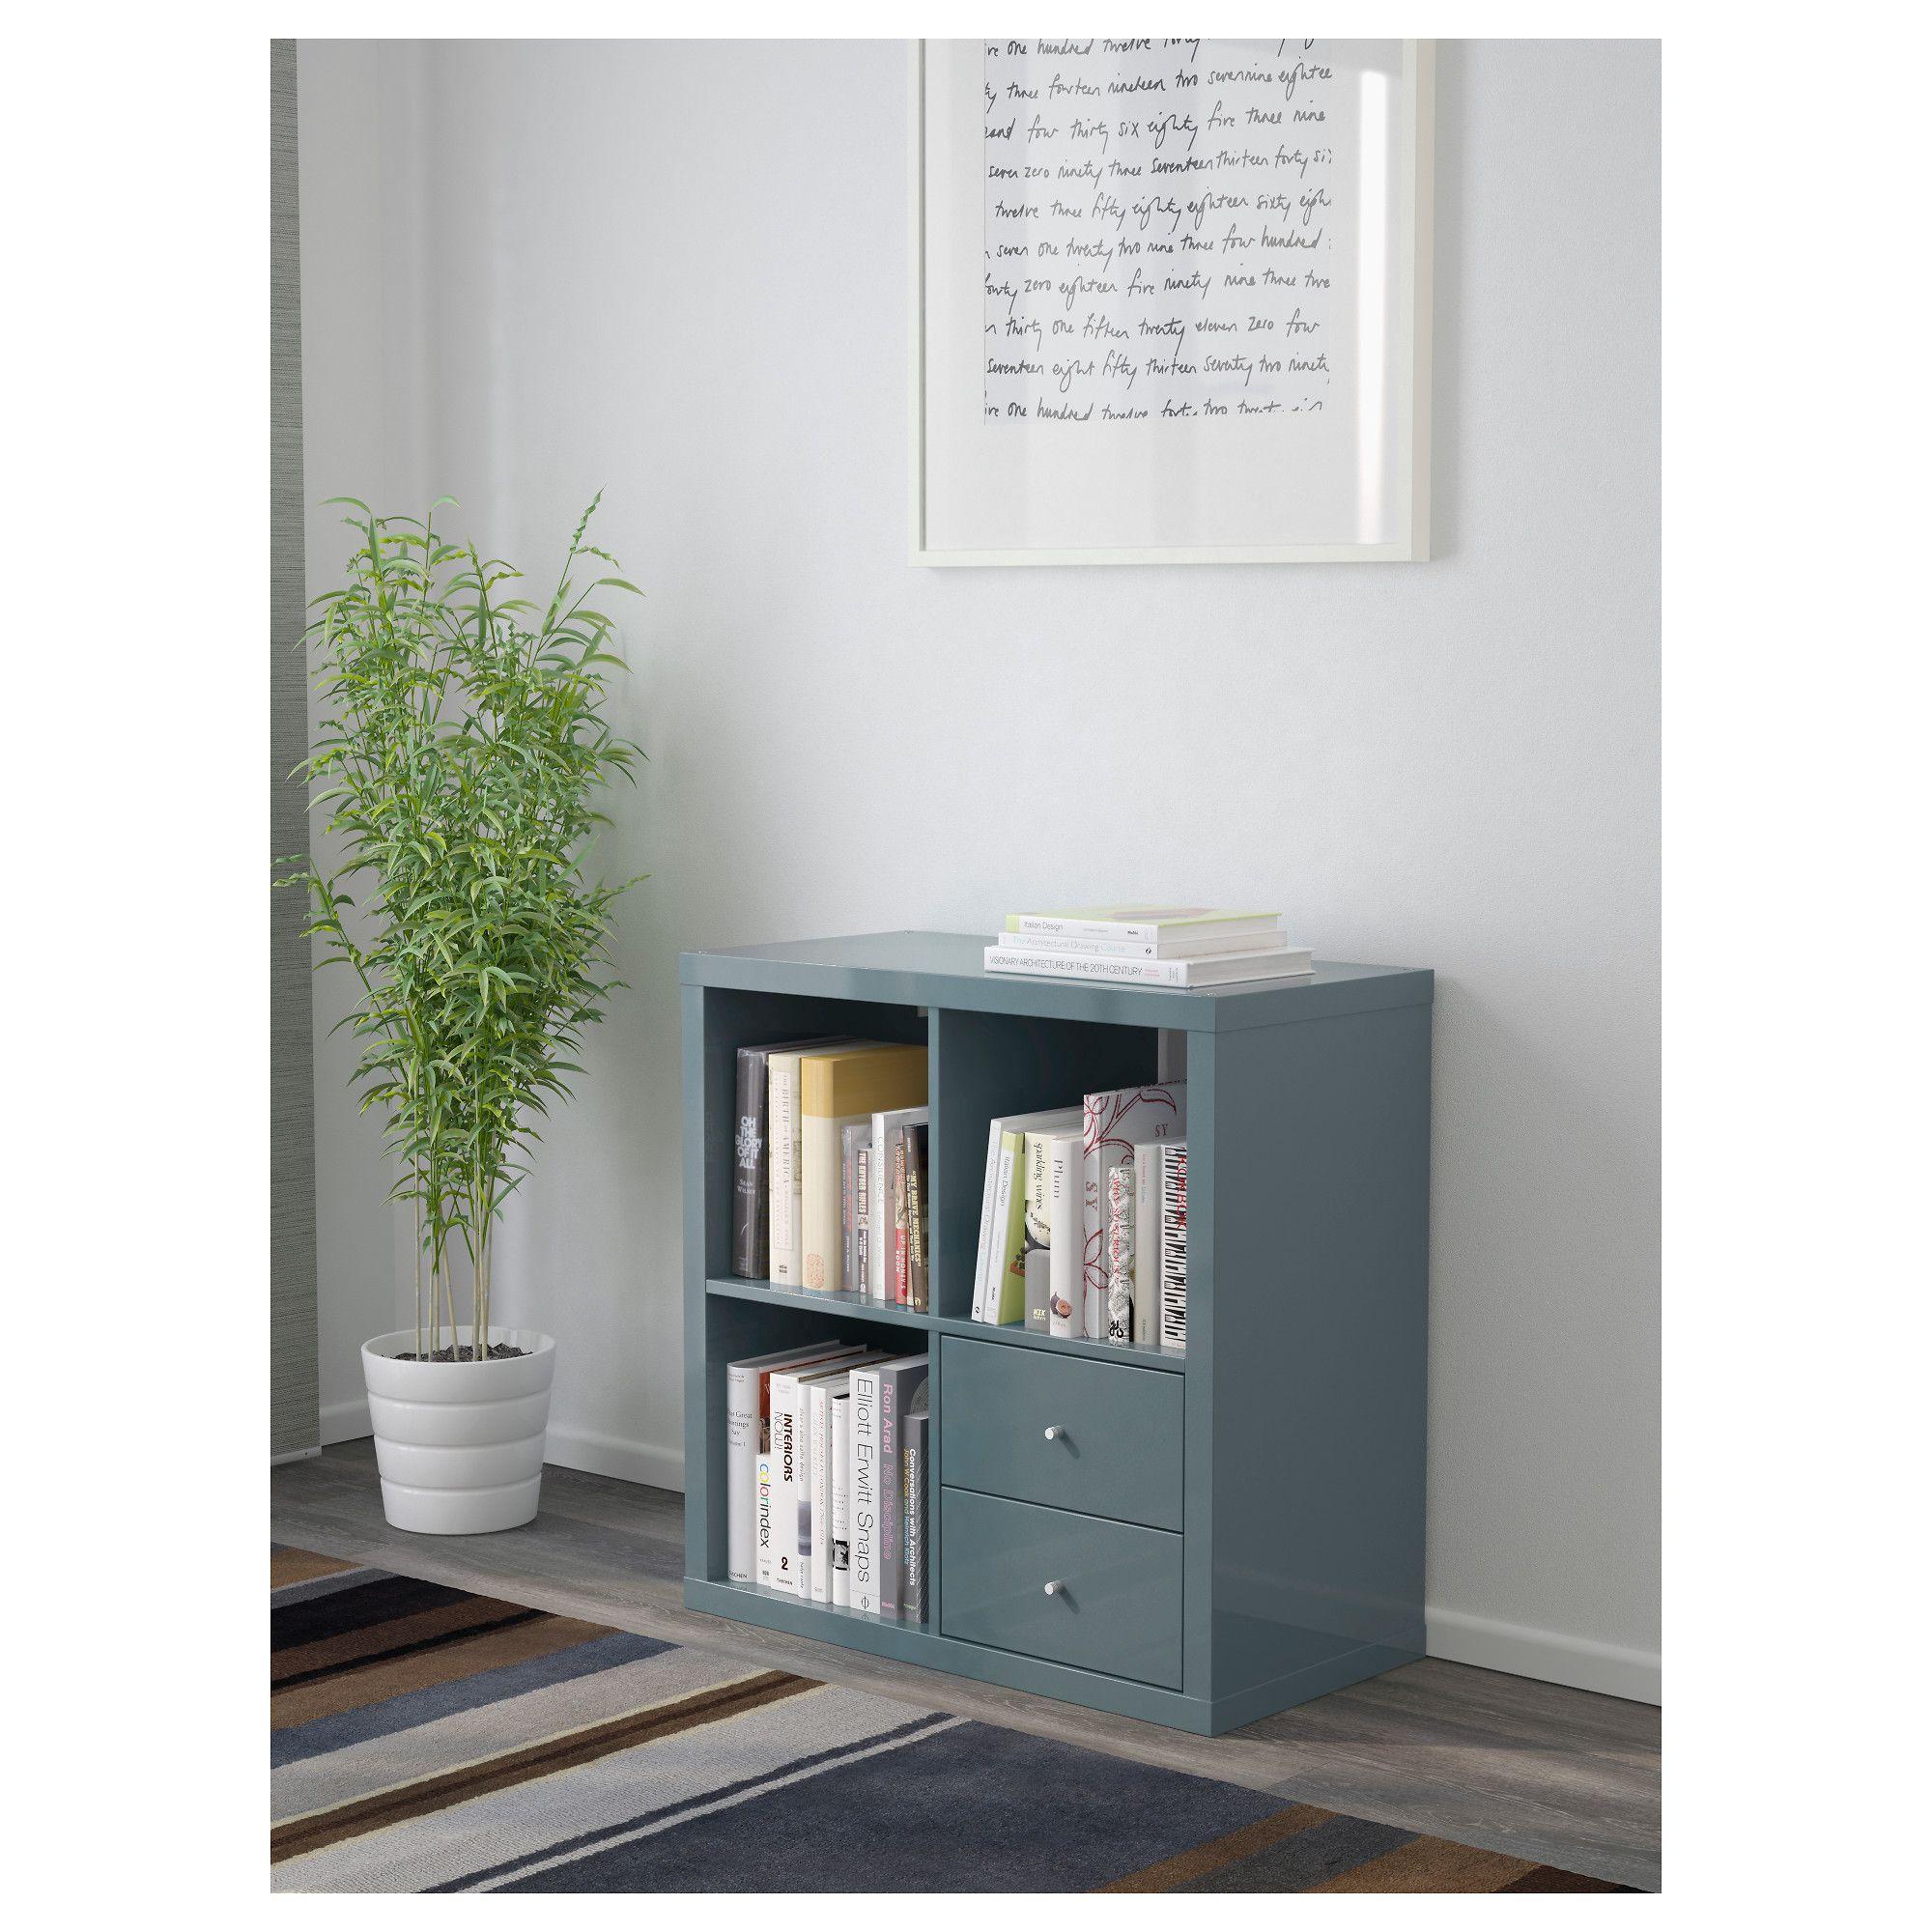 ikea - kallax shelf unit with drawers high-gloss gray-turquoise